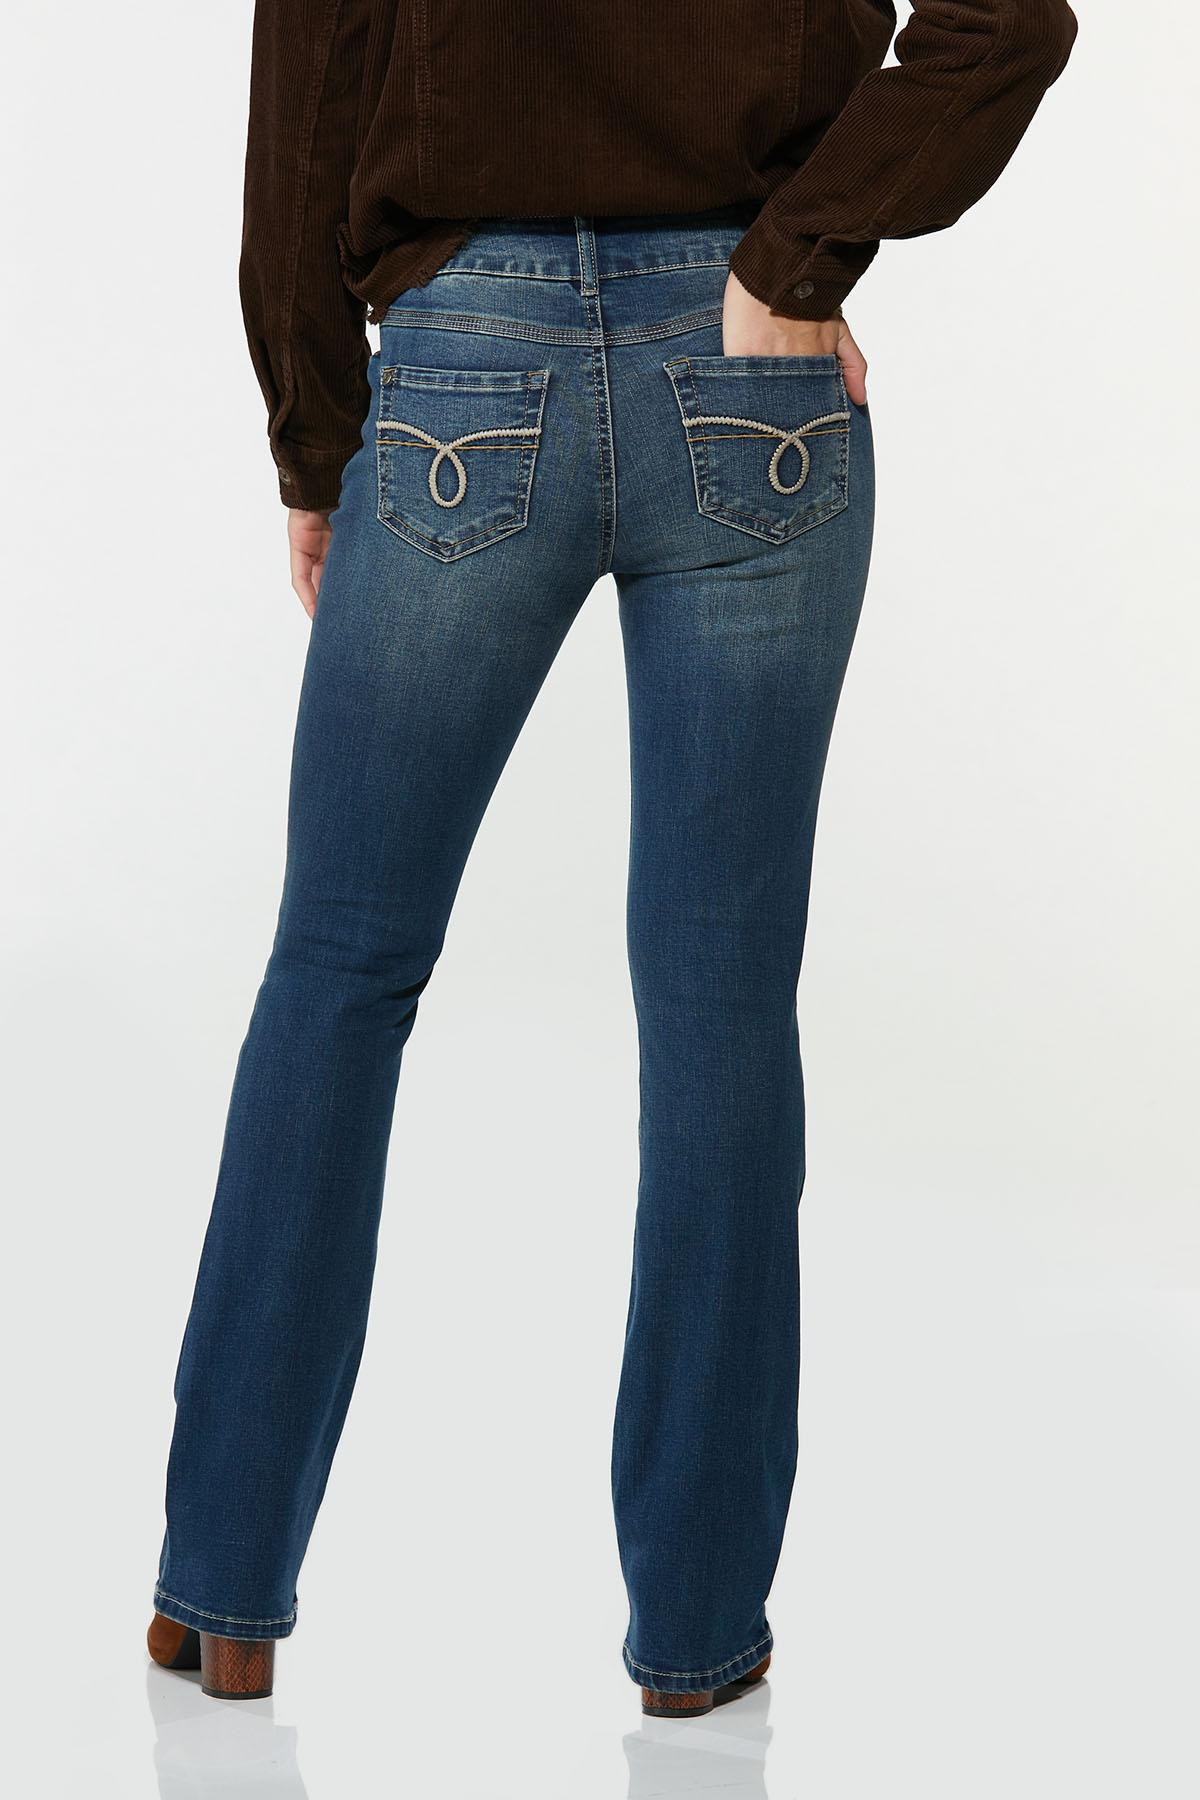 Petite Slimming Bootcut Jeans (Item #44693256)